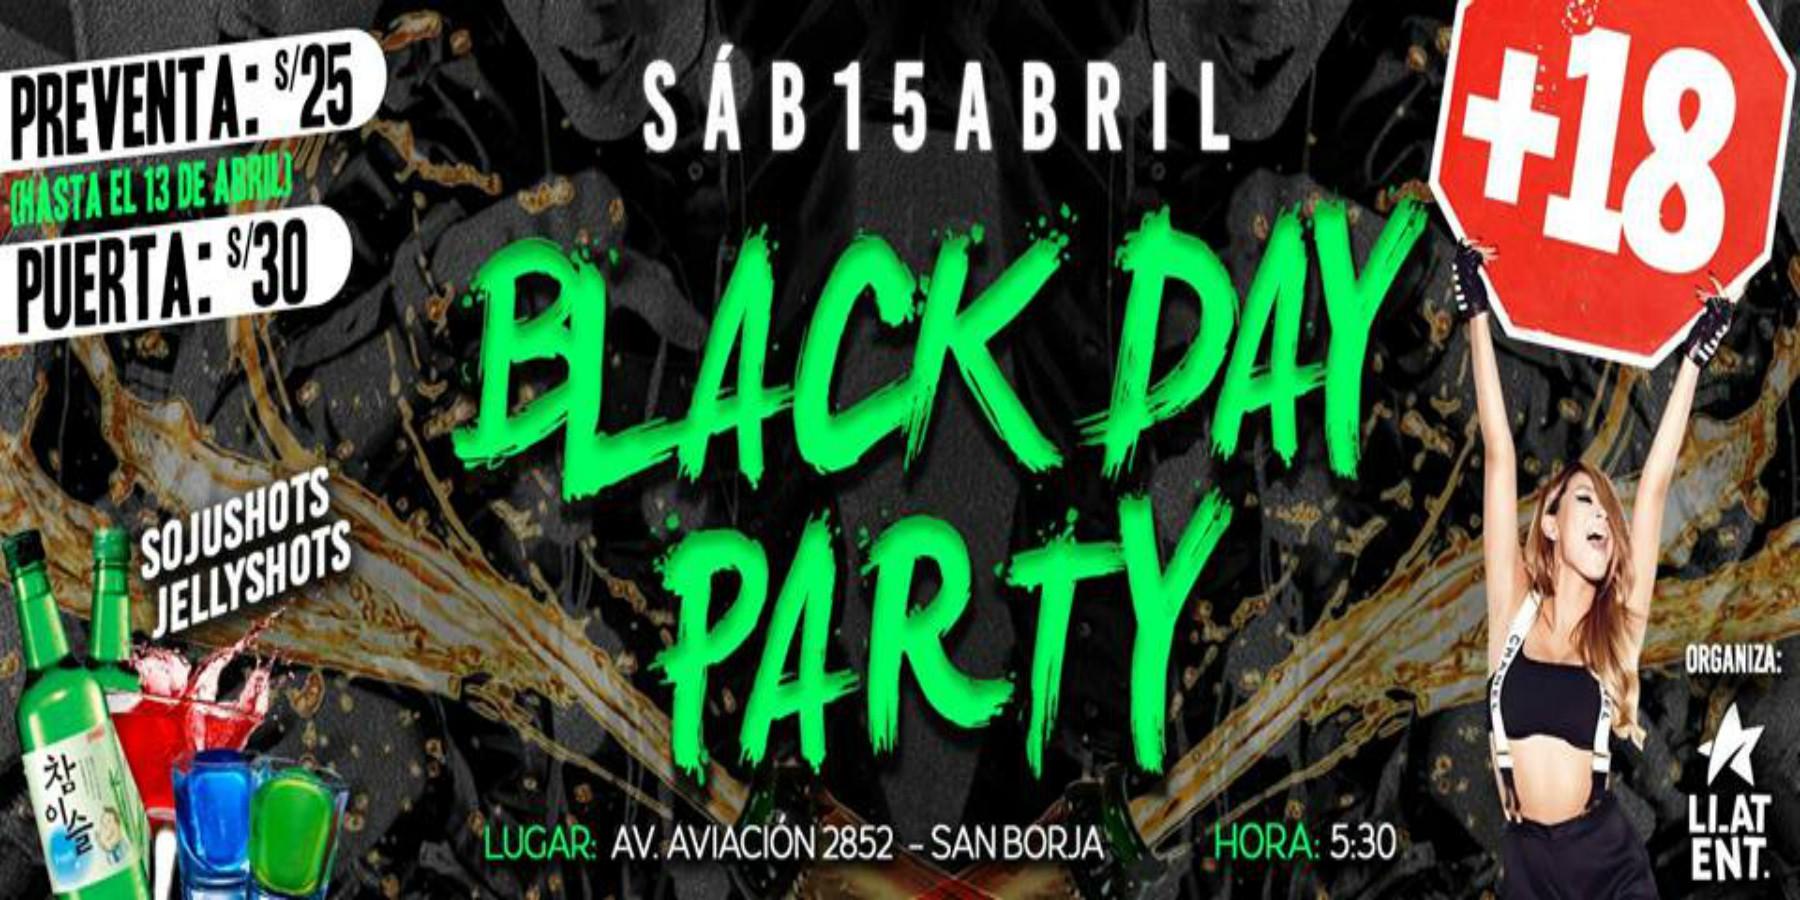 BLACK DAY PARTY | Celebra tu soltería este 15 de abril